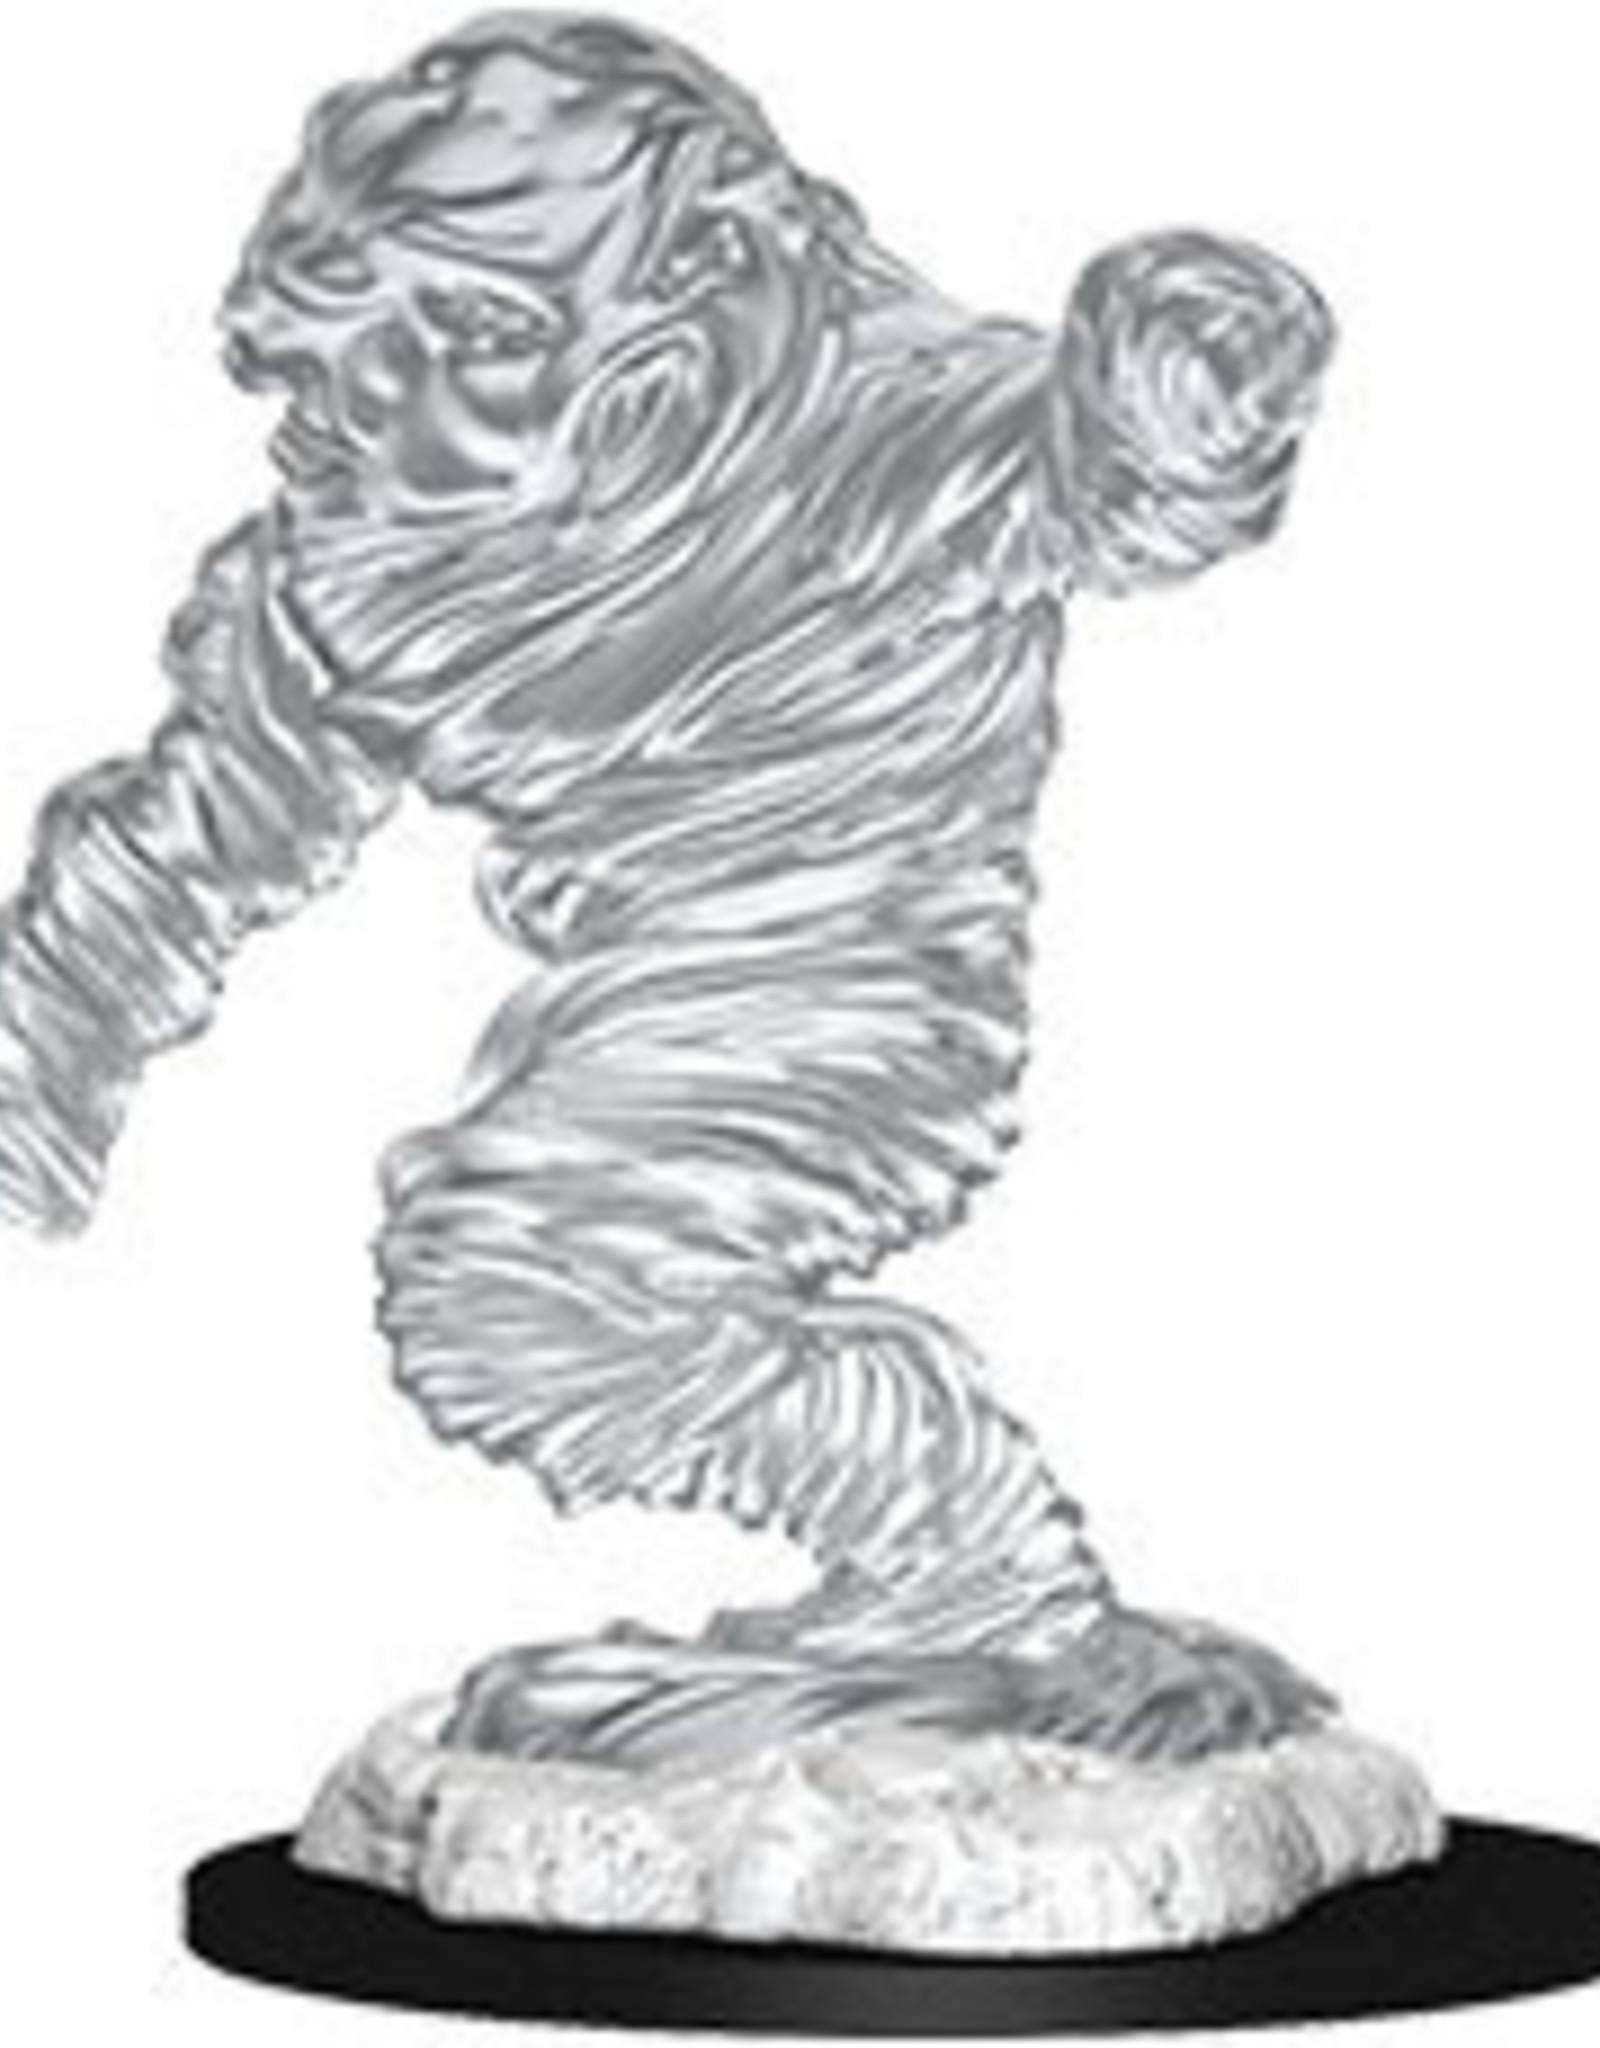 WizKids Dungeons & Dragons Nolzur's Marvelous Miniatures: Air Elemental